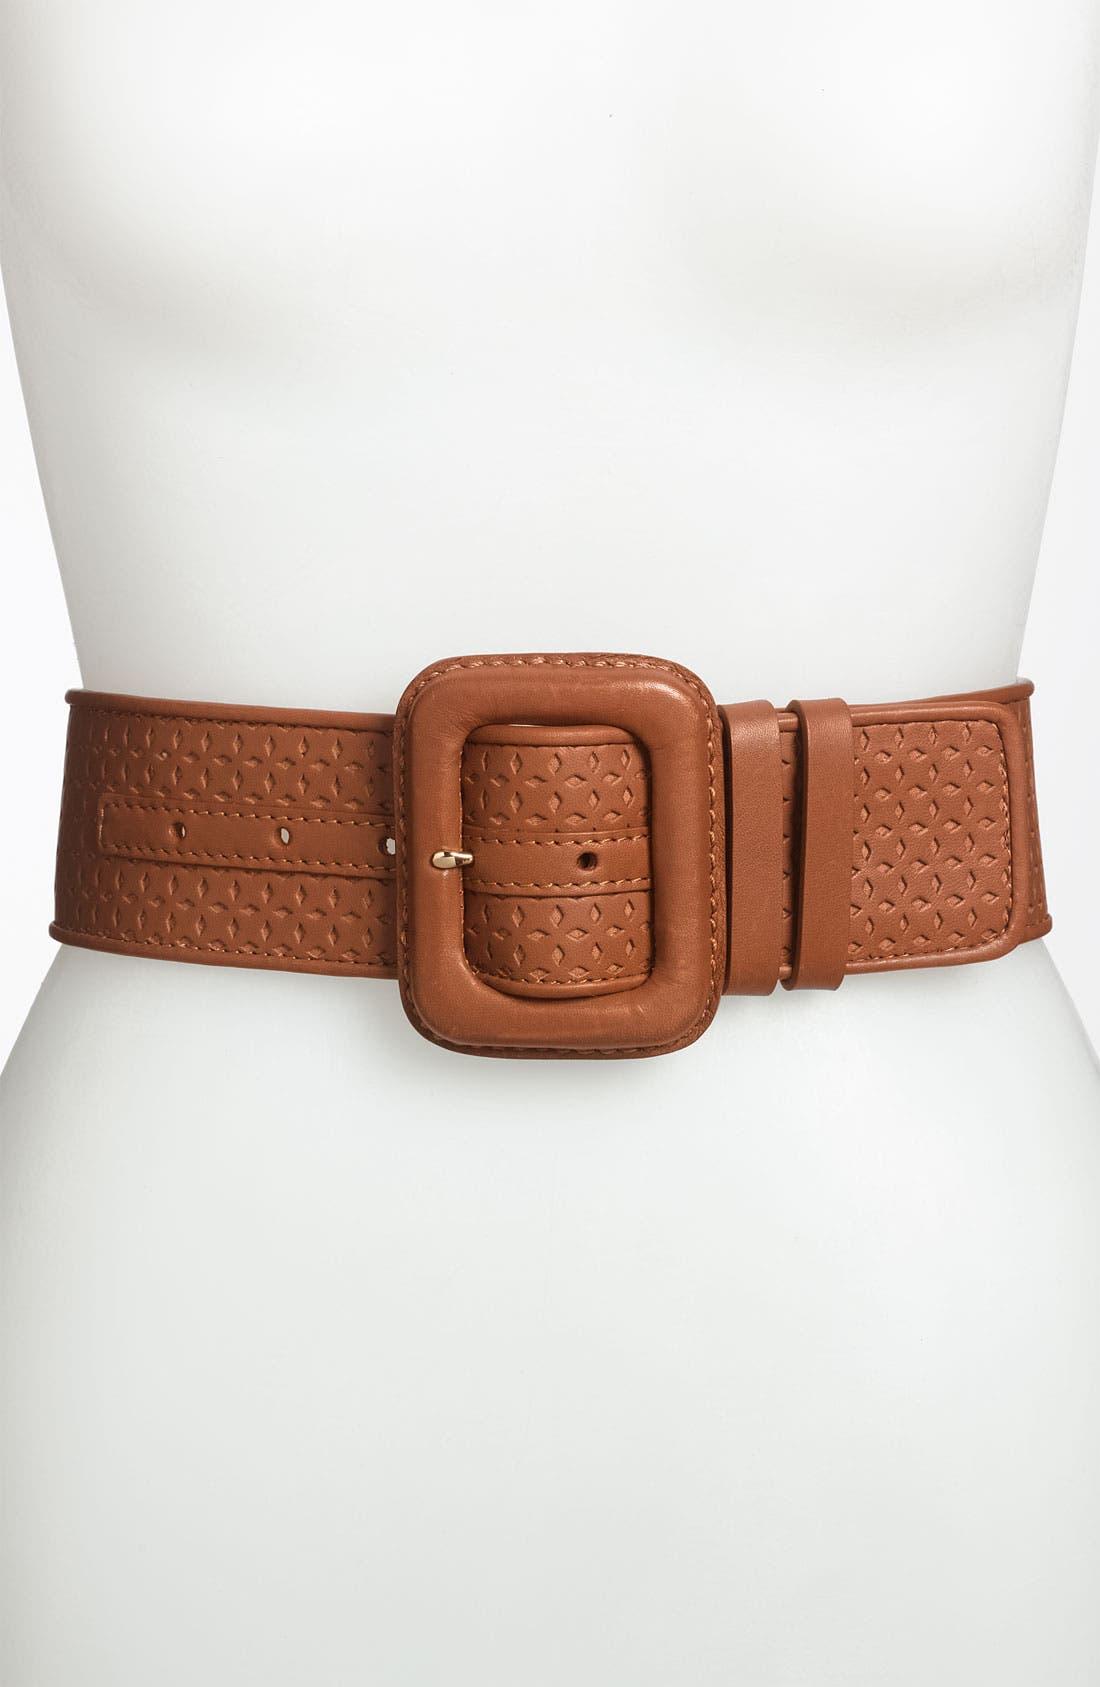 Main Image - Cole Haan 'Vintage Valise' Belt